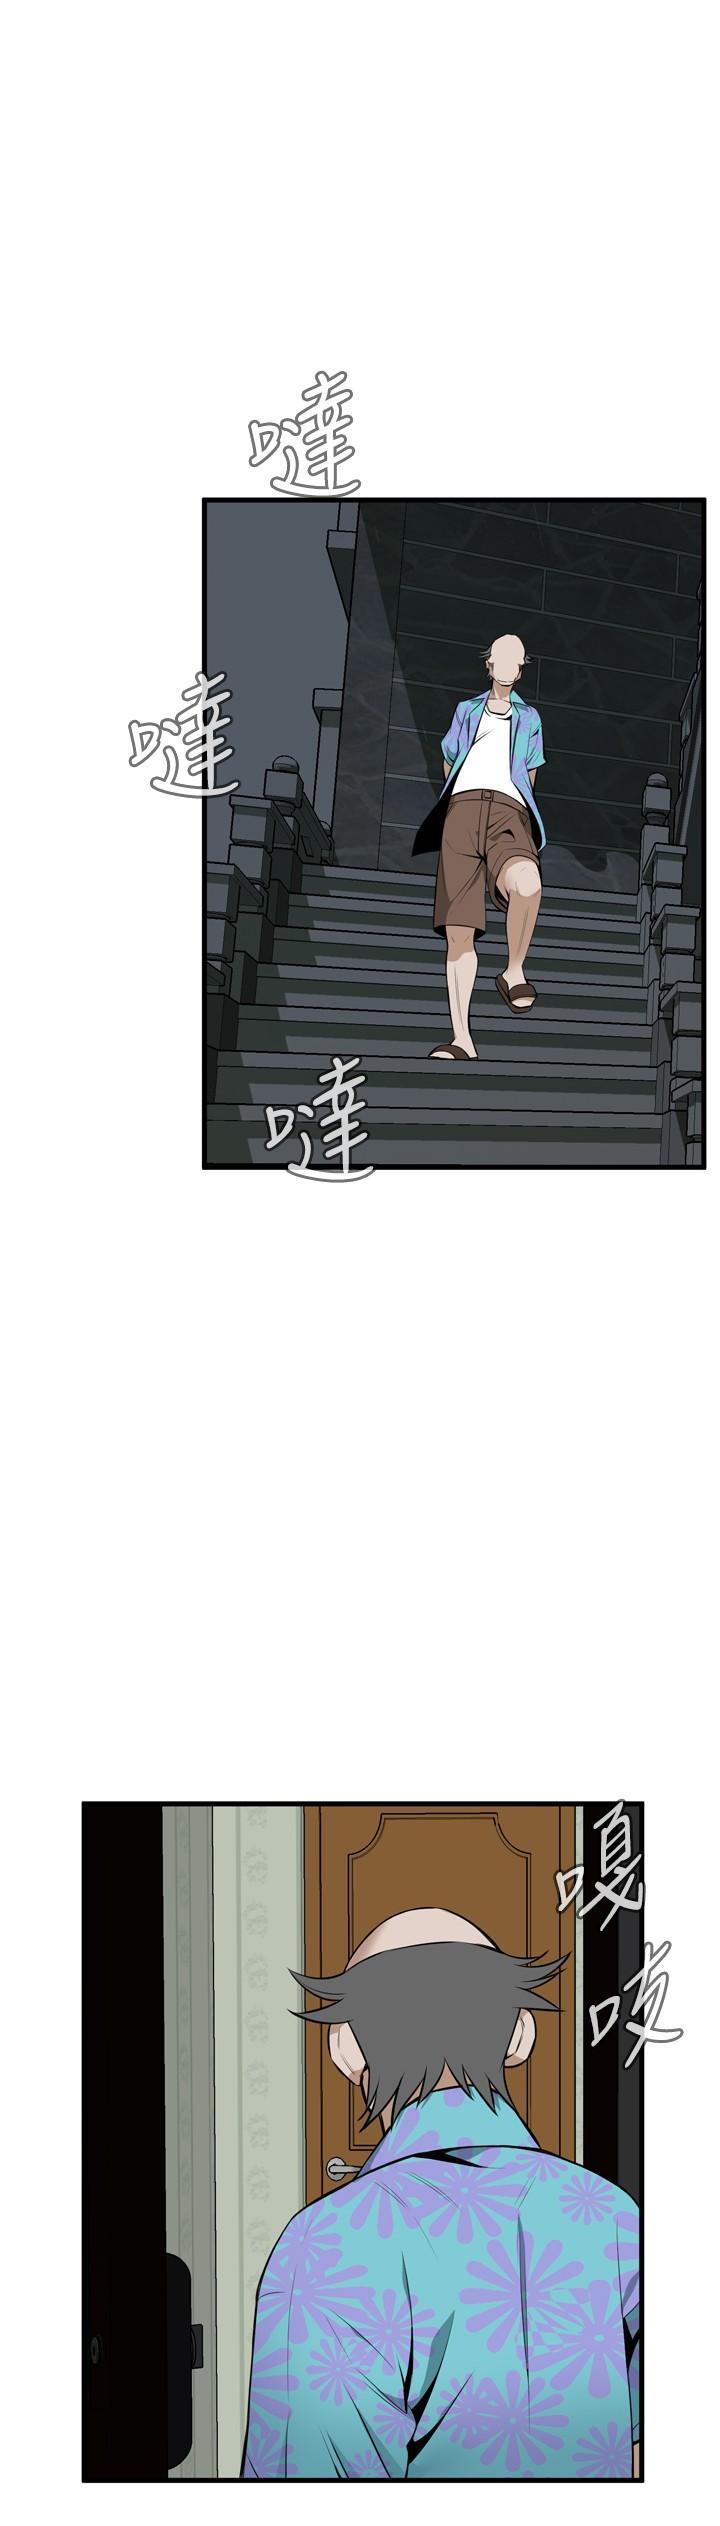 Take a Peek 偷窥 Ch.39~51 [Chinese]中文 142